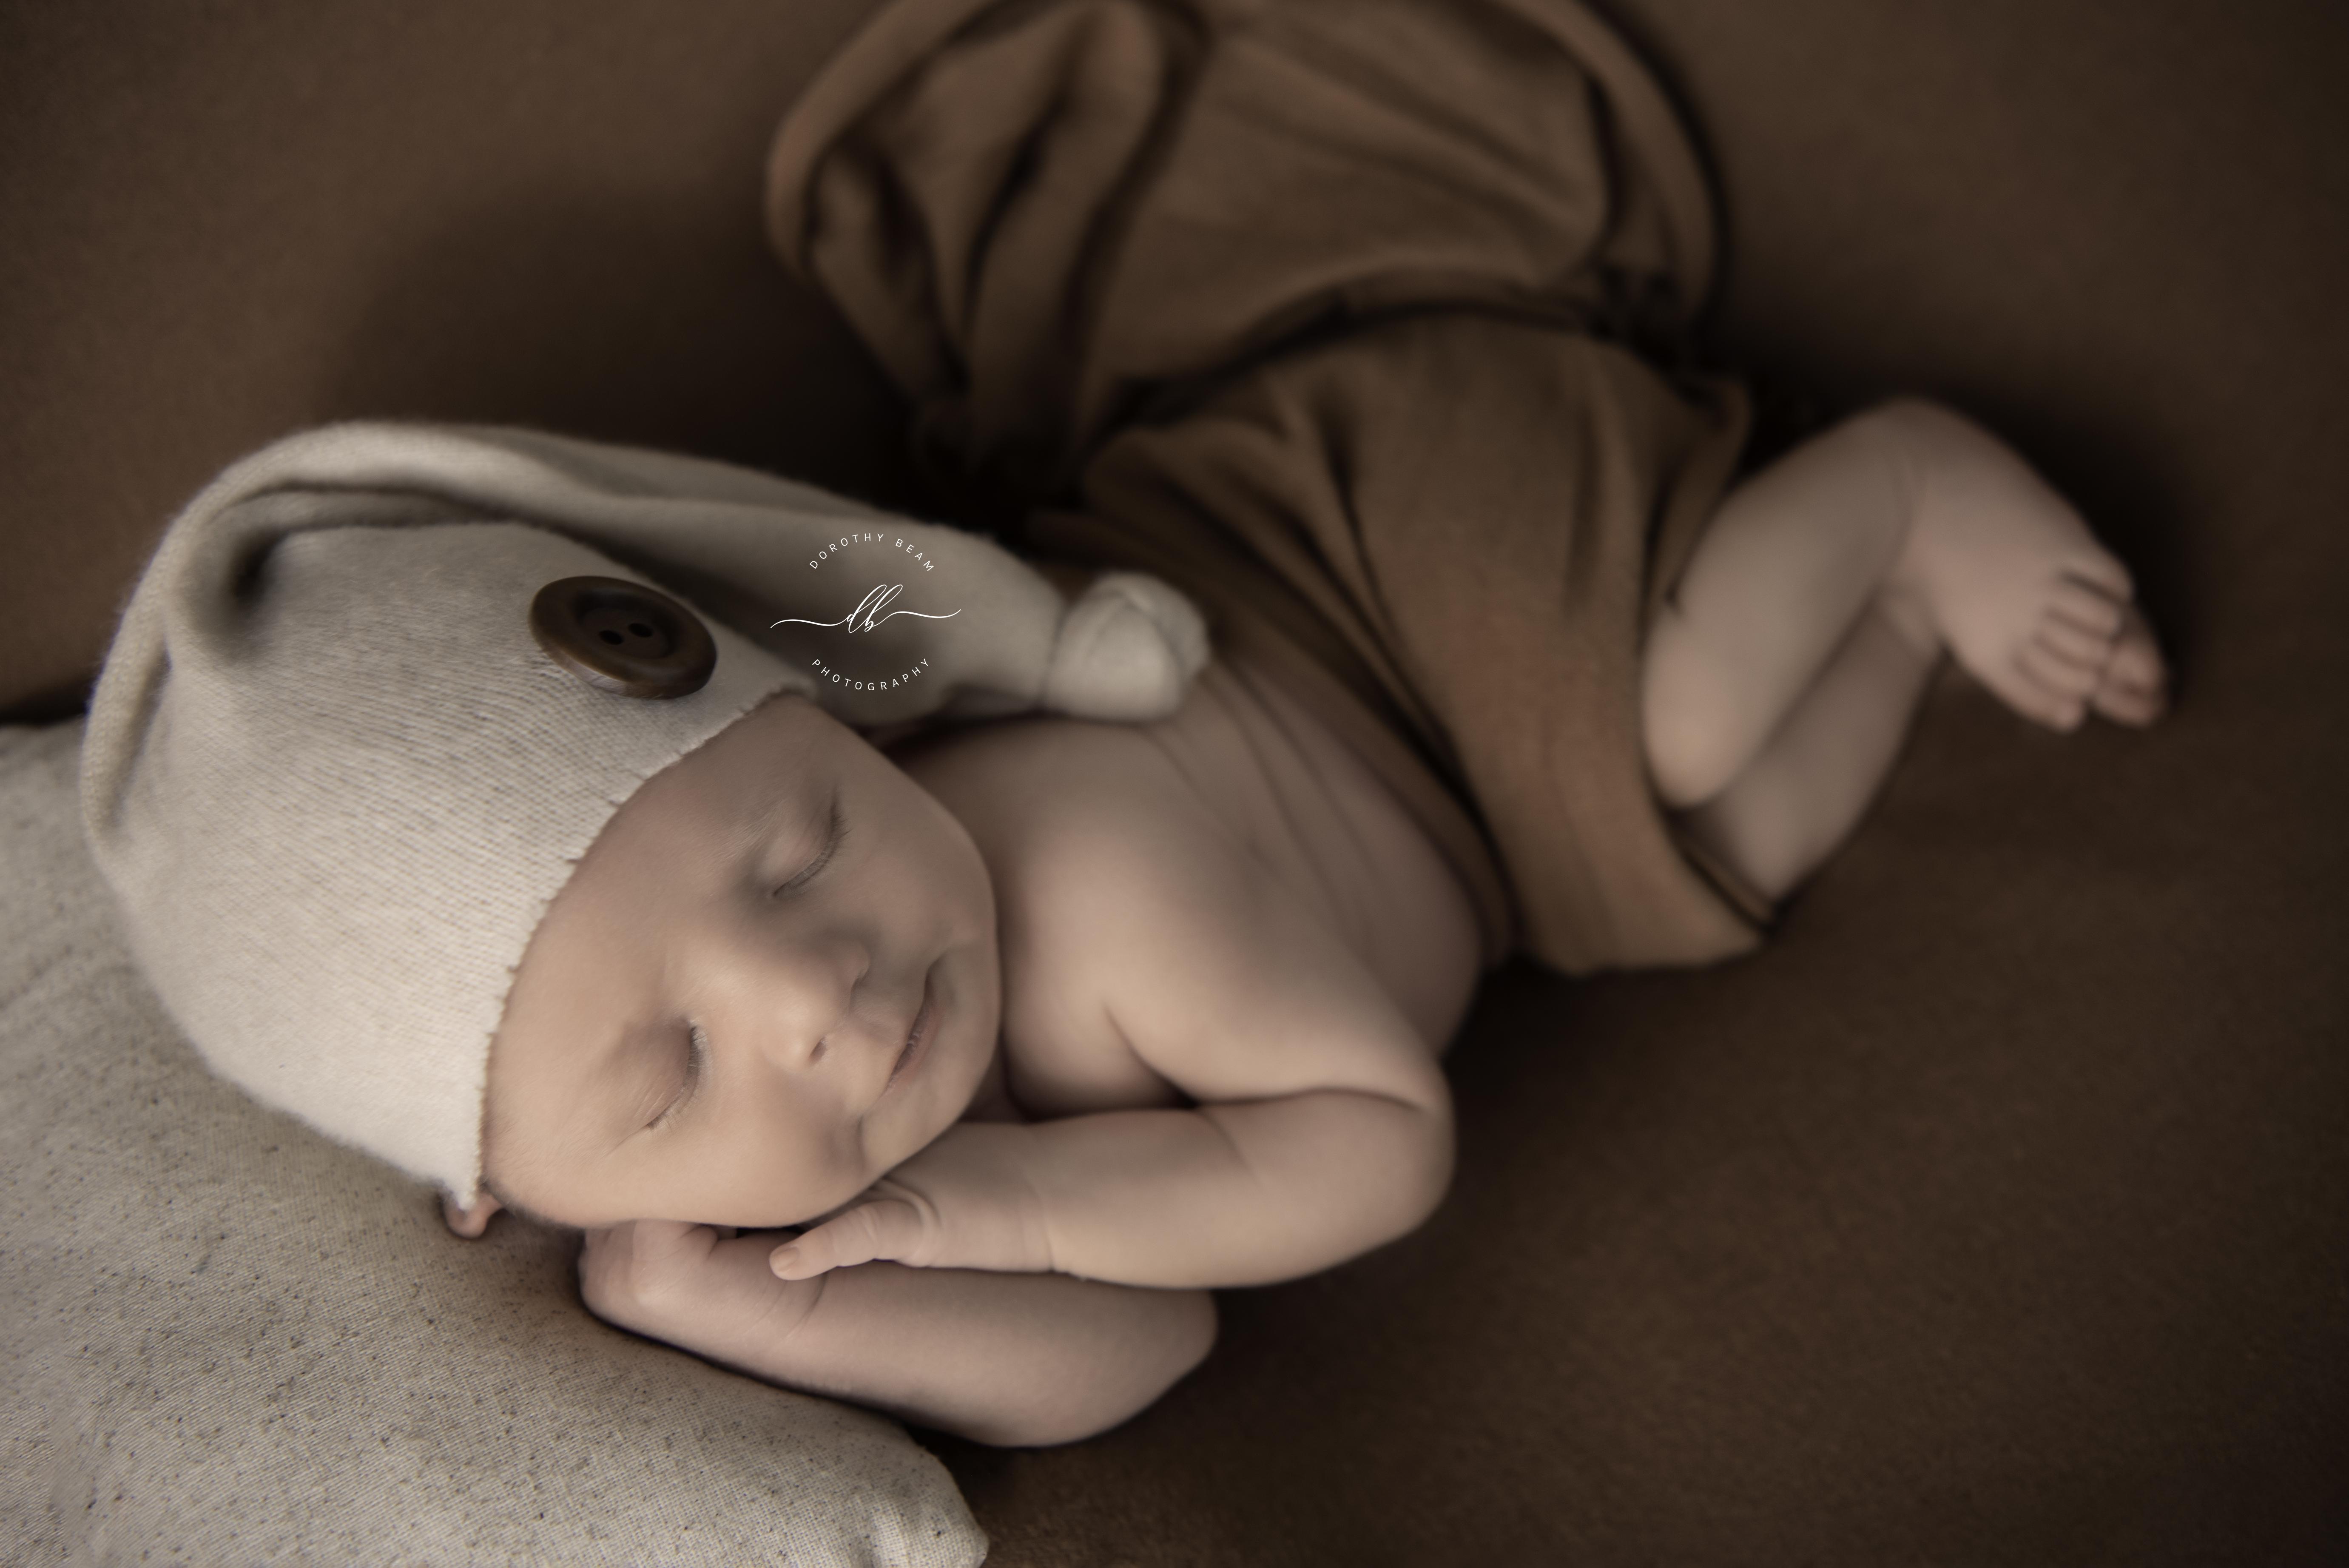 Boy Brown Camel Sleepy Hat Side Laying P